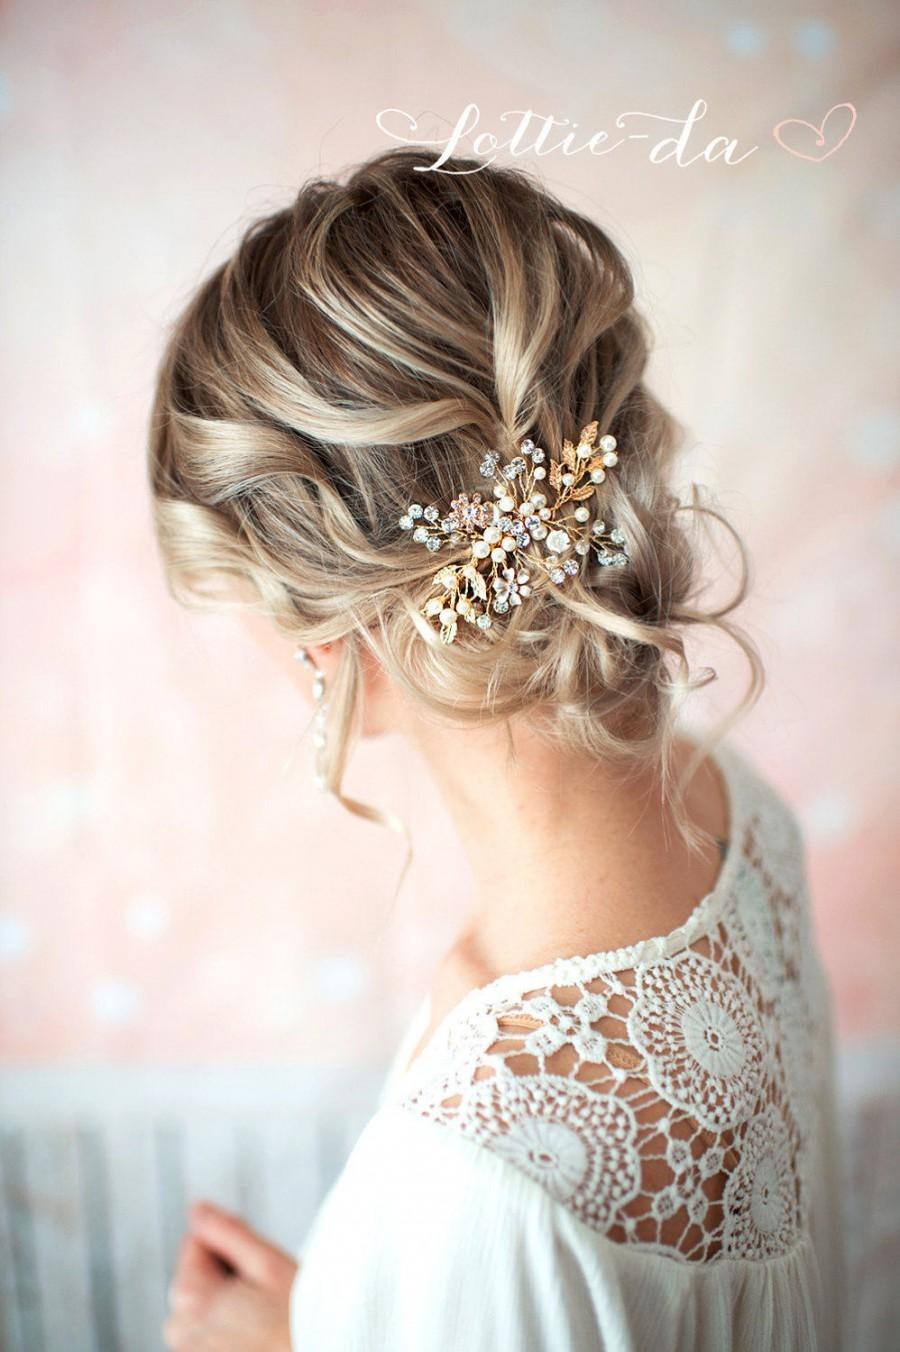 gold-boho-hair-vine-comb-bridal-pearl-flower-hair-comb-wedding-hair-vine-wedding-pearl-hair-comb-boho-wedding-headpiece-39zara39.jpg